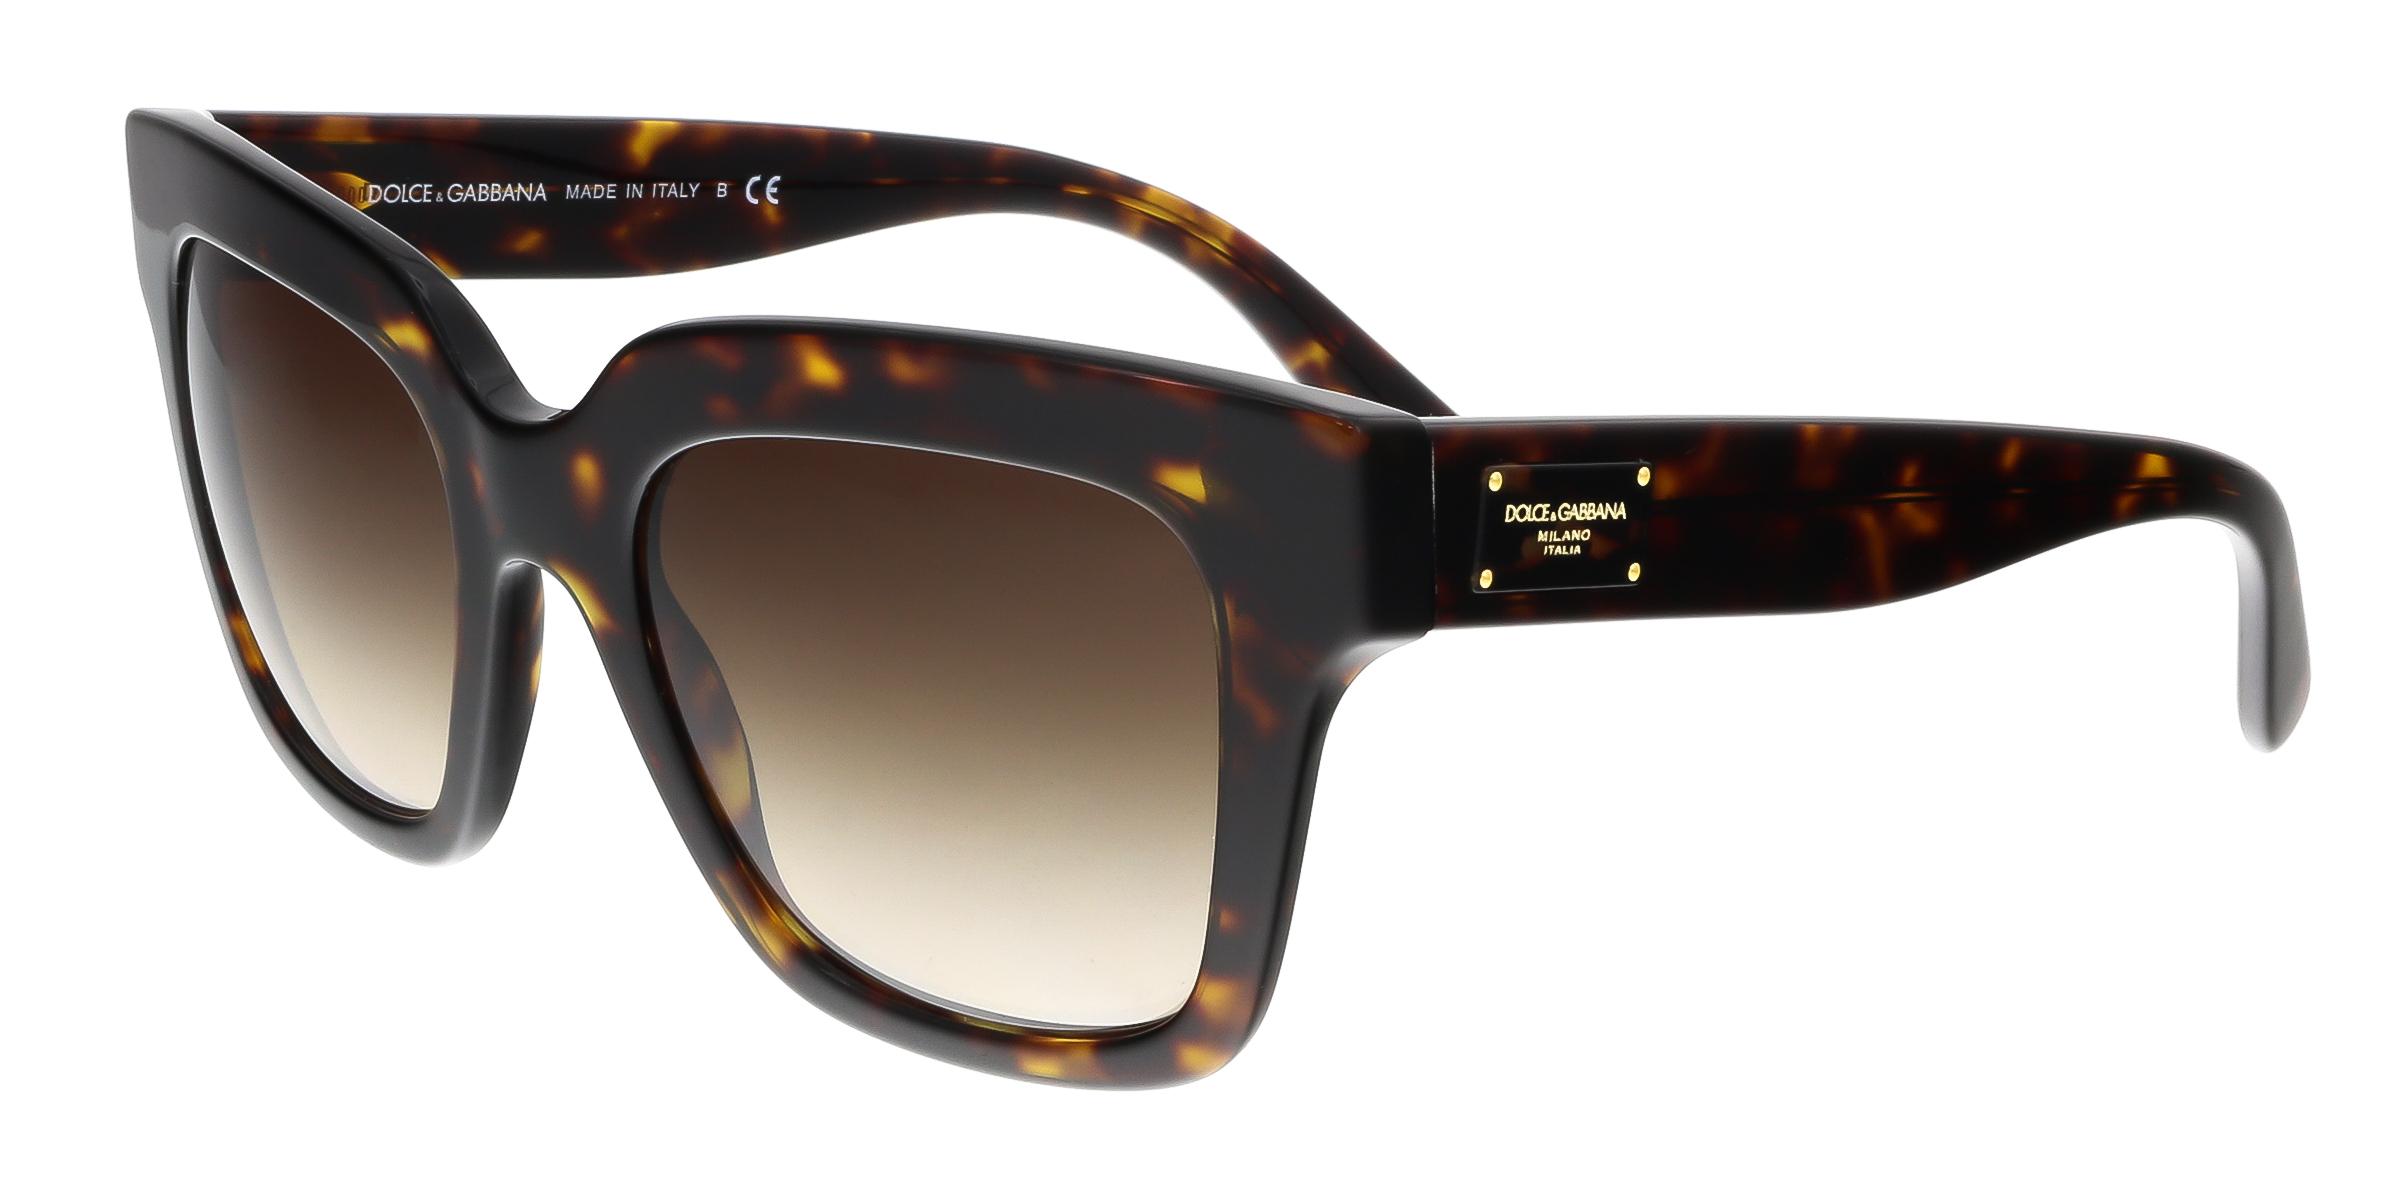 Dolce & Gabbana DG4286 502/13 Havana Square Sunglasses